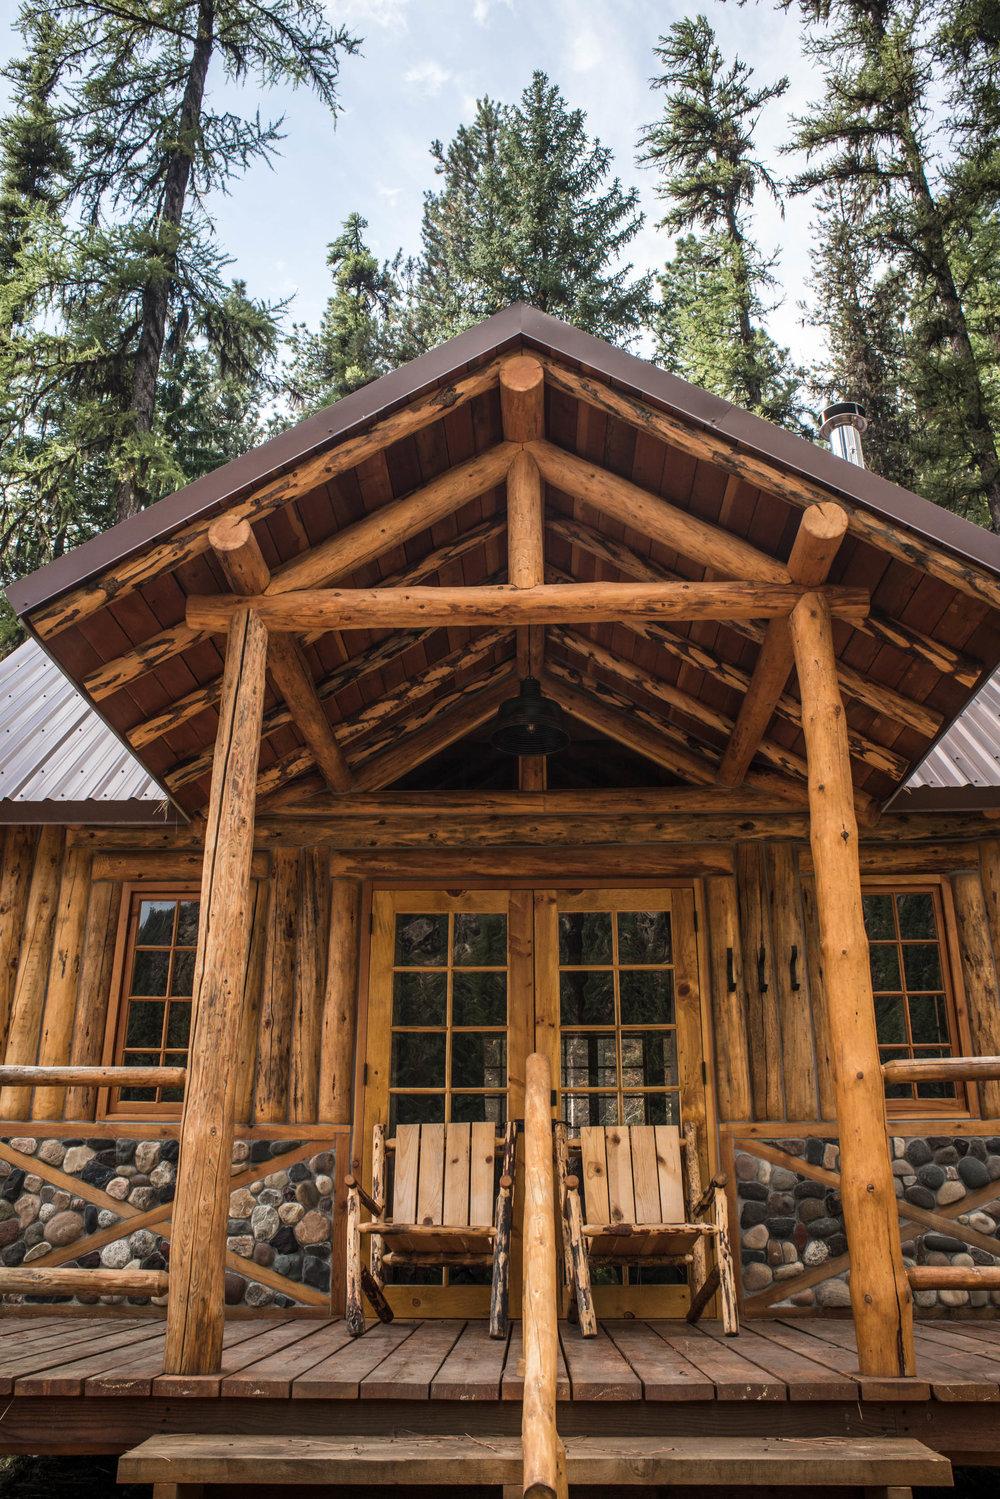 Minam_River_Lodge_Wallowa_Mountains_Eagle_Cap_Wilderness_Oregon_Autumn_2017_Please_Credit_Talia_Jean_Galvin-127.jpg